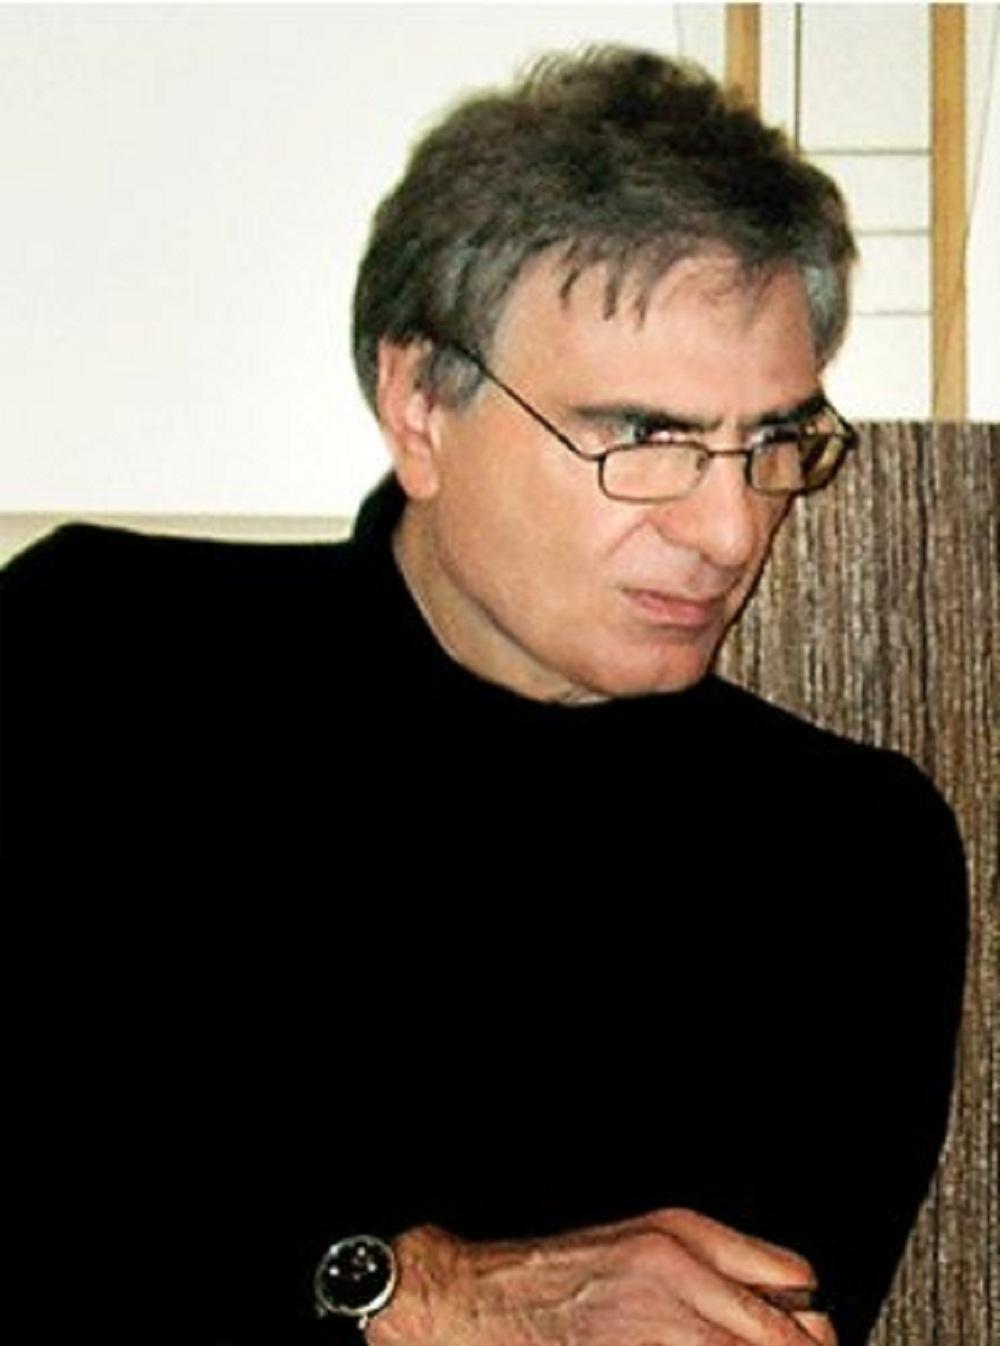 معمار ایرانی فرهاد احمدی (پاورپوینت)